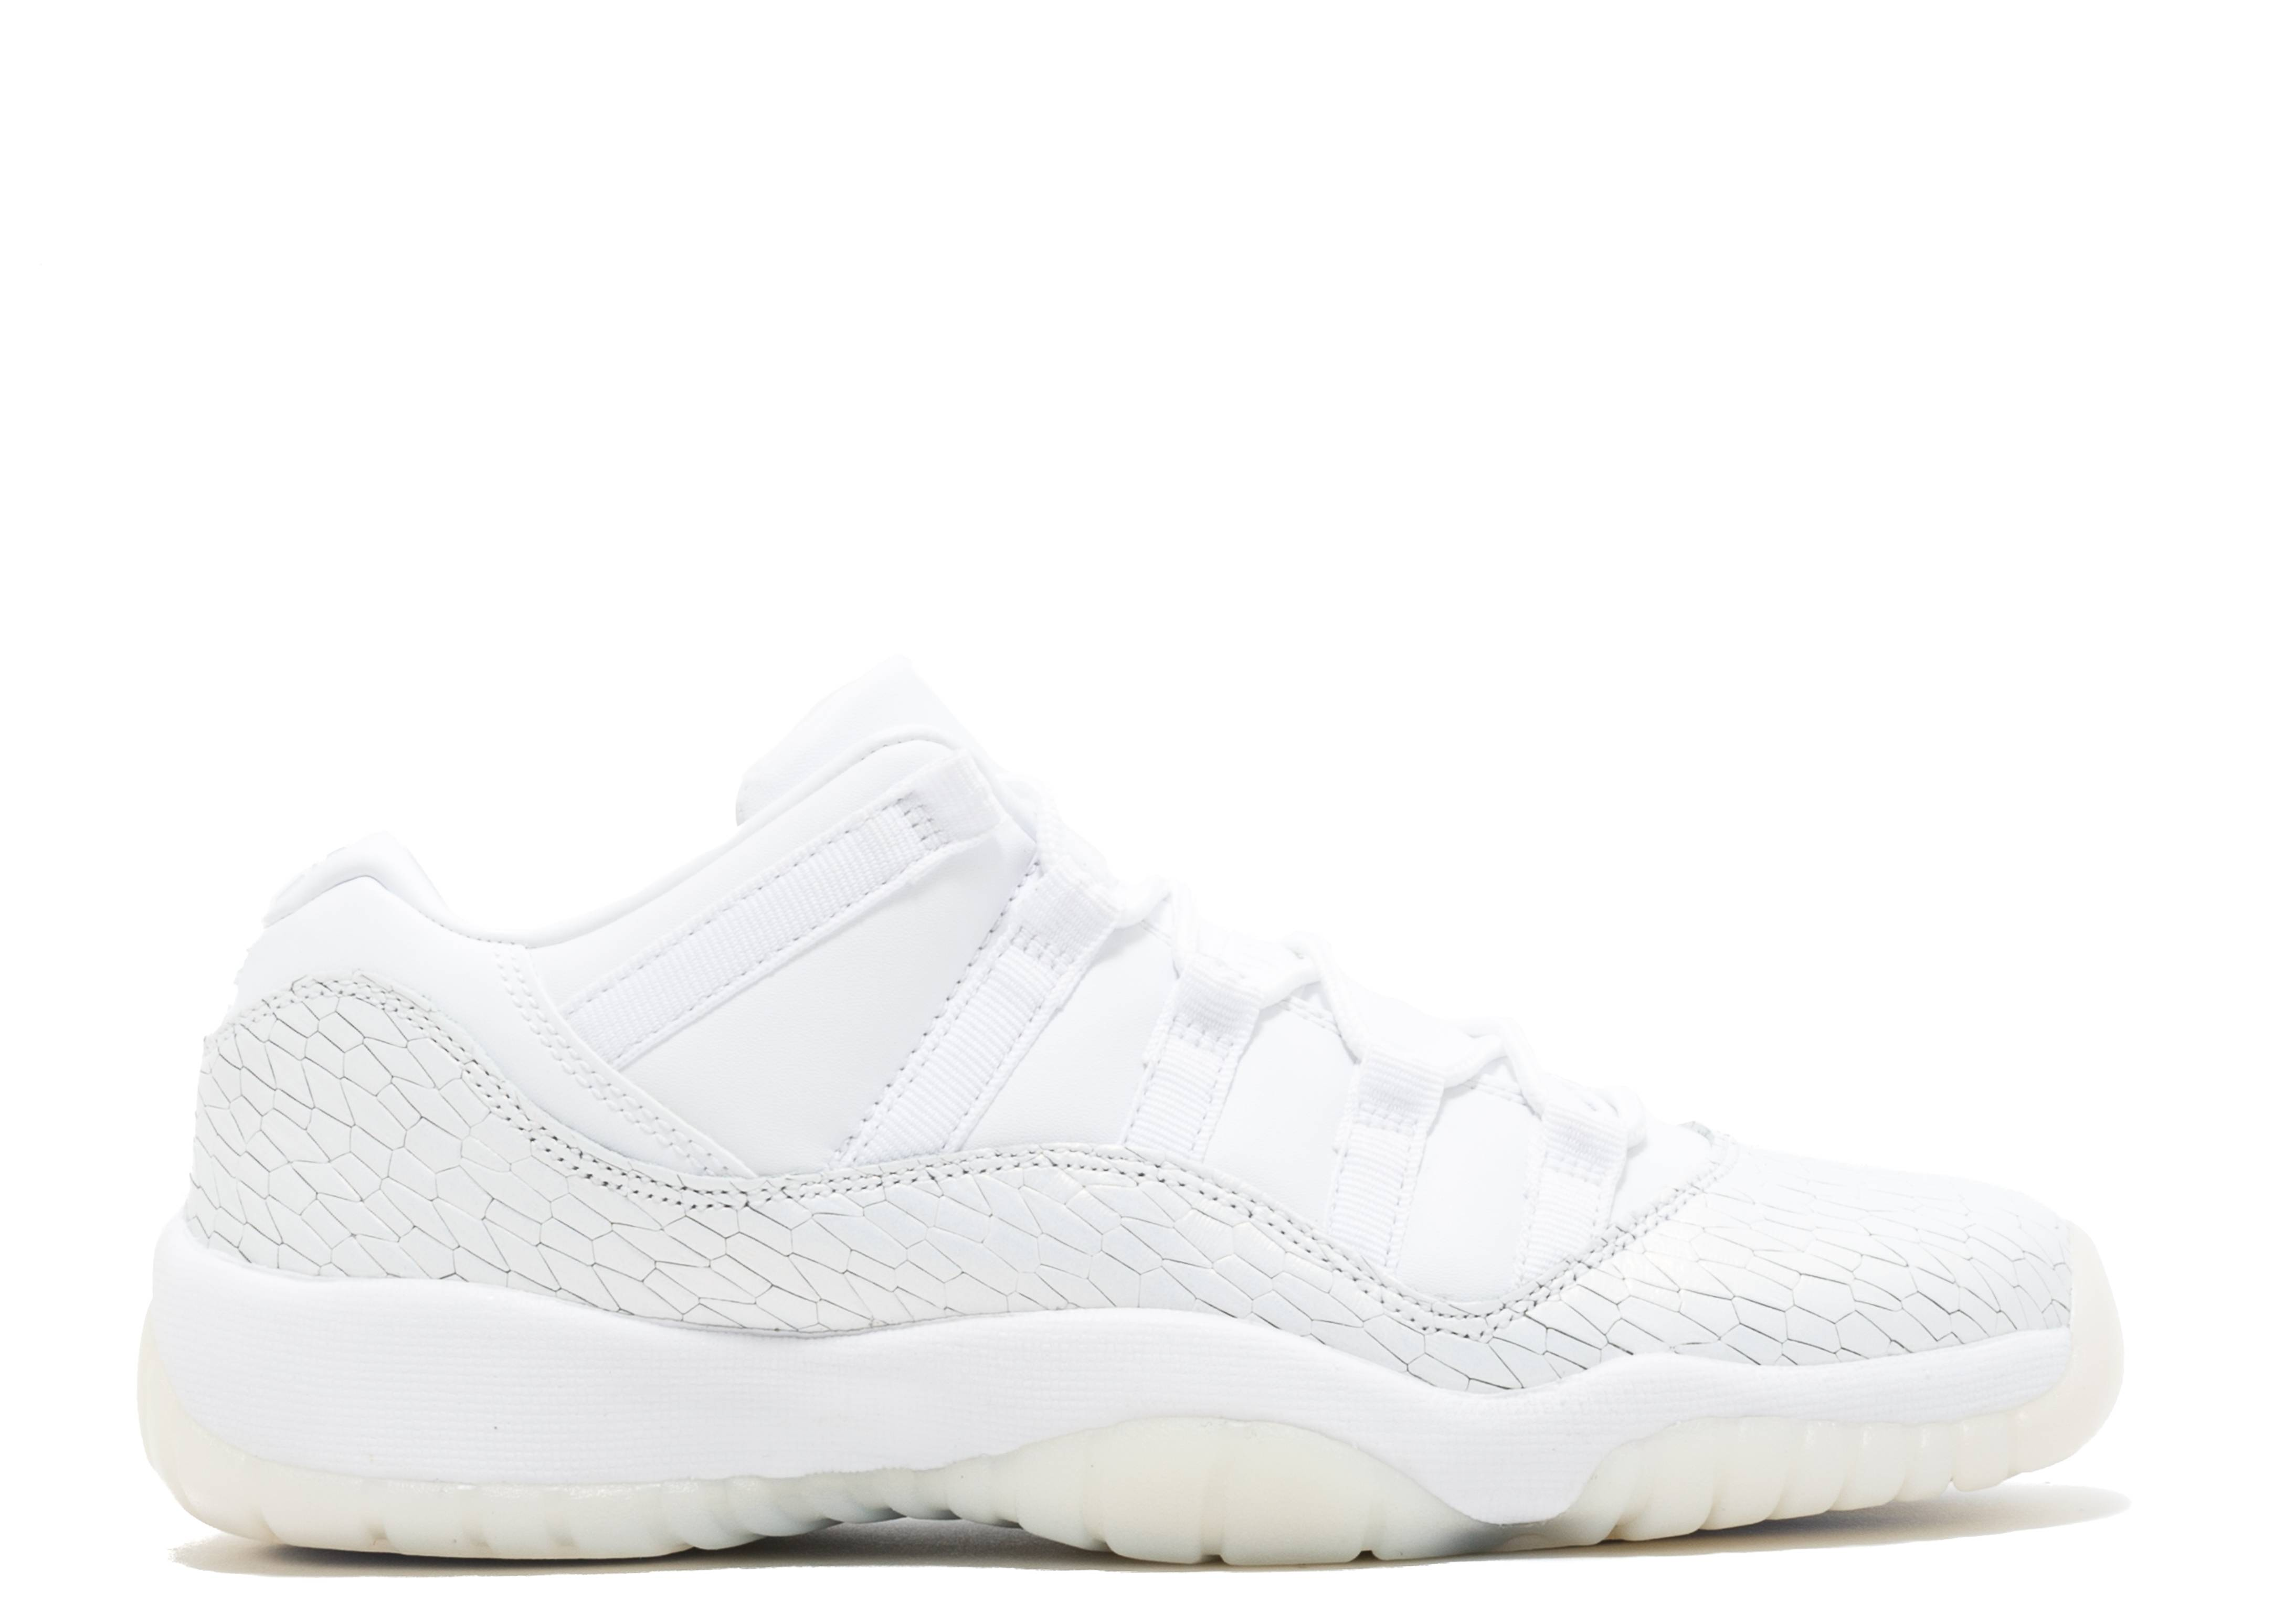 Air Jordan 11 Tout Blanc